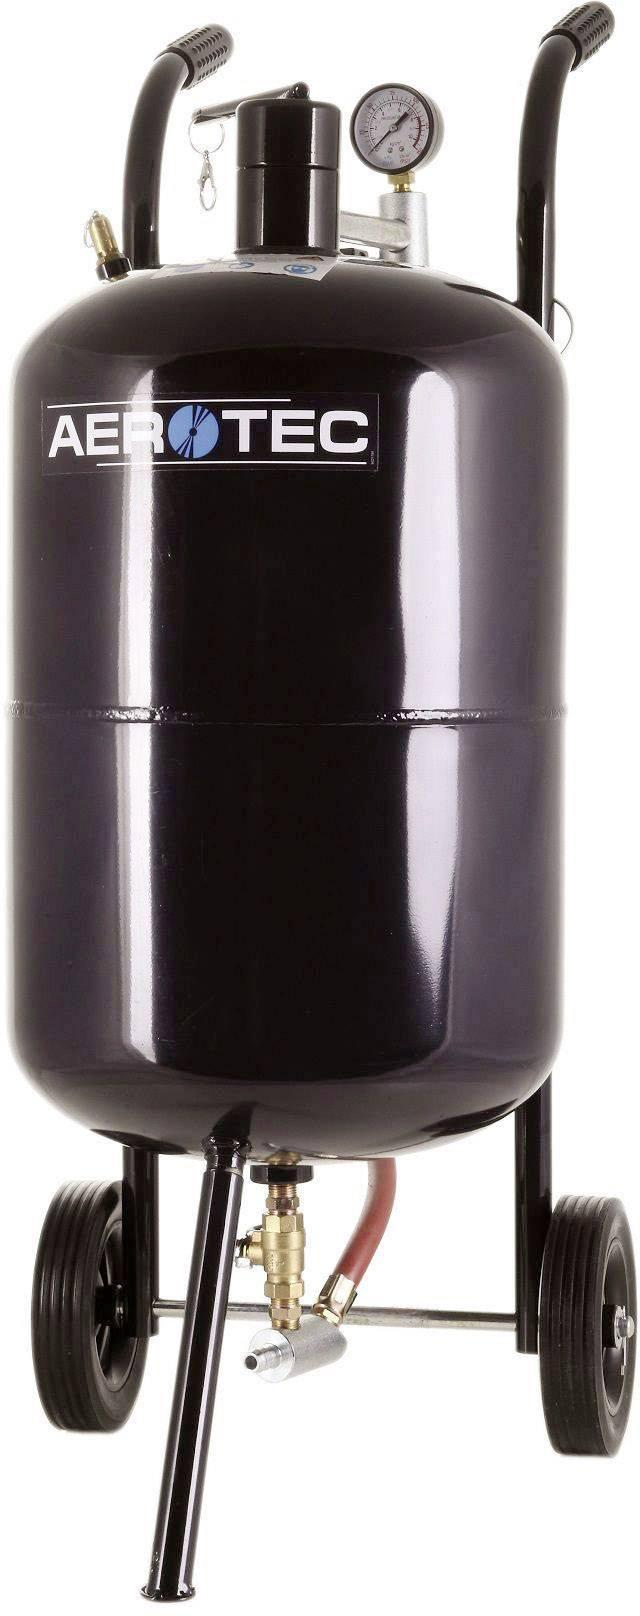 Mobilní otryskávač Aerotec 2009536, objem tlak. nádoby 36 l, Tlak (max.) 6.3 bar